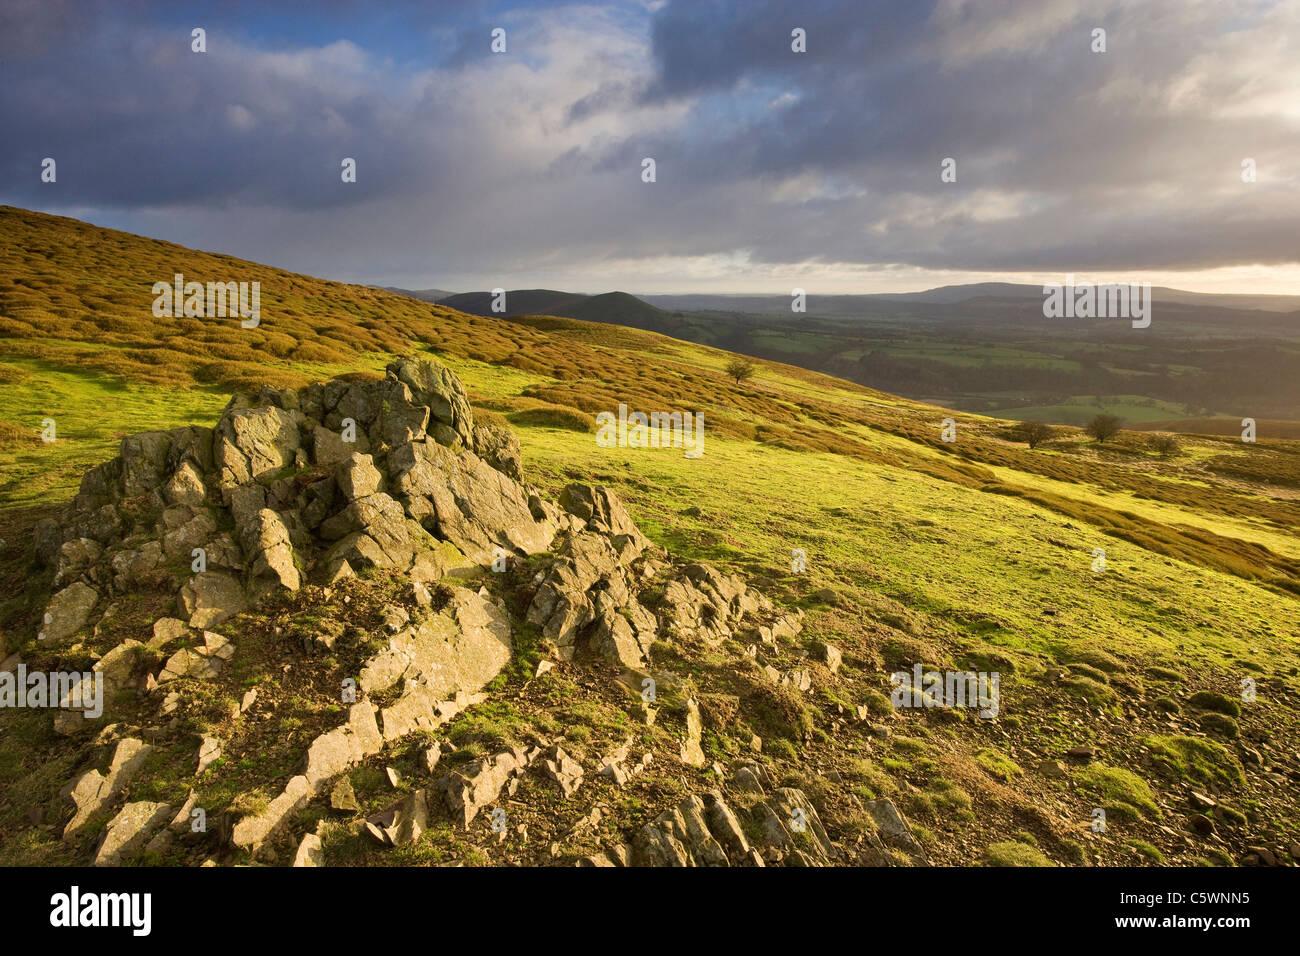 Long Mynd, Shropshire, England, Great Britain. - Stock Image